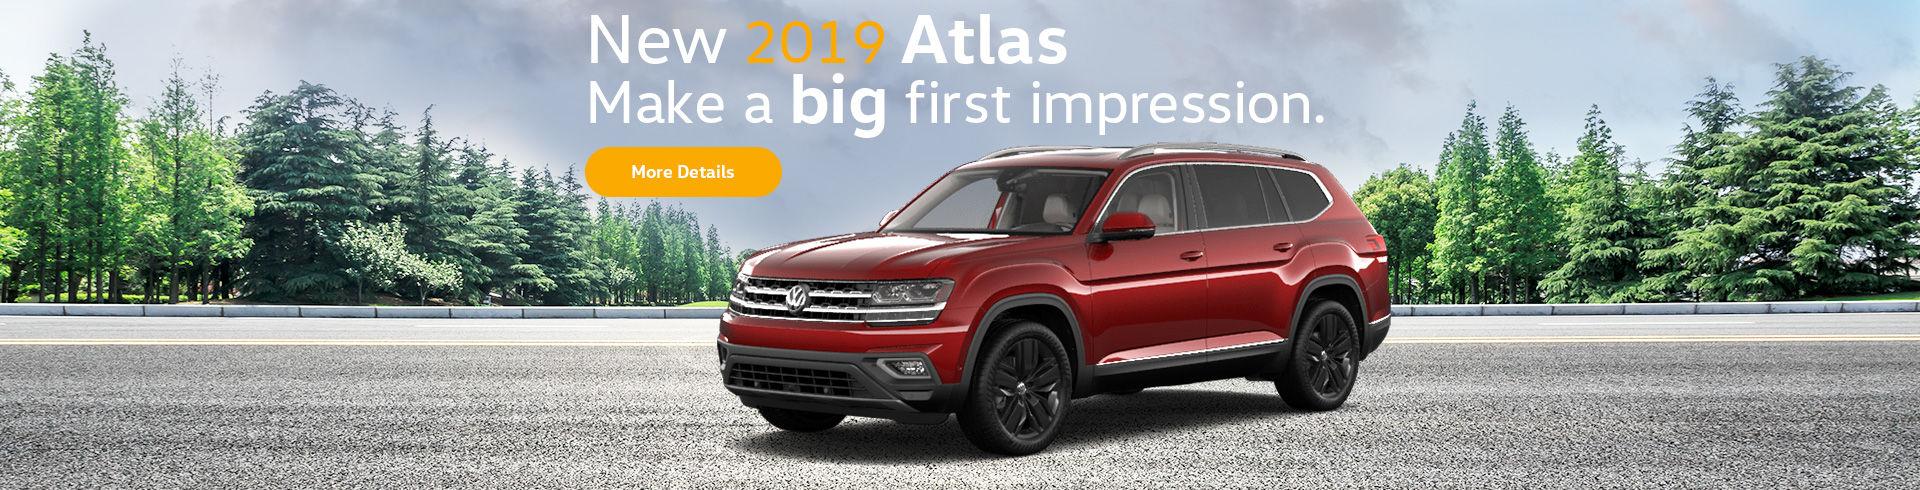 New 2019 Atlas